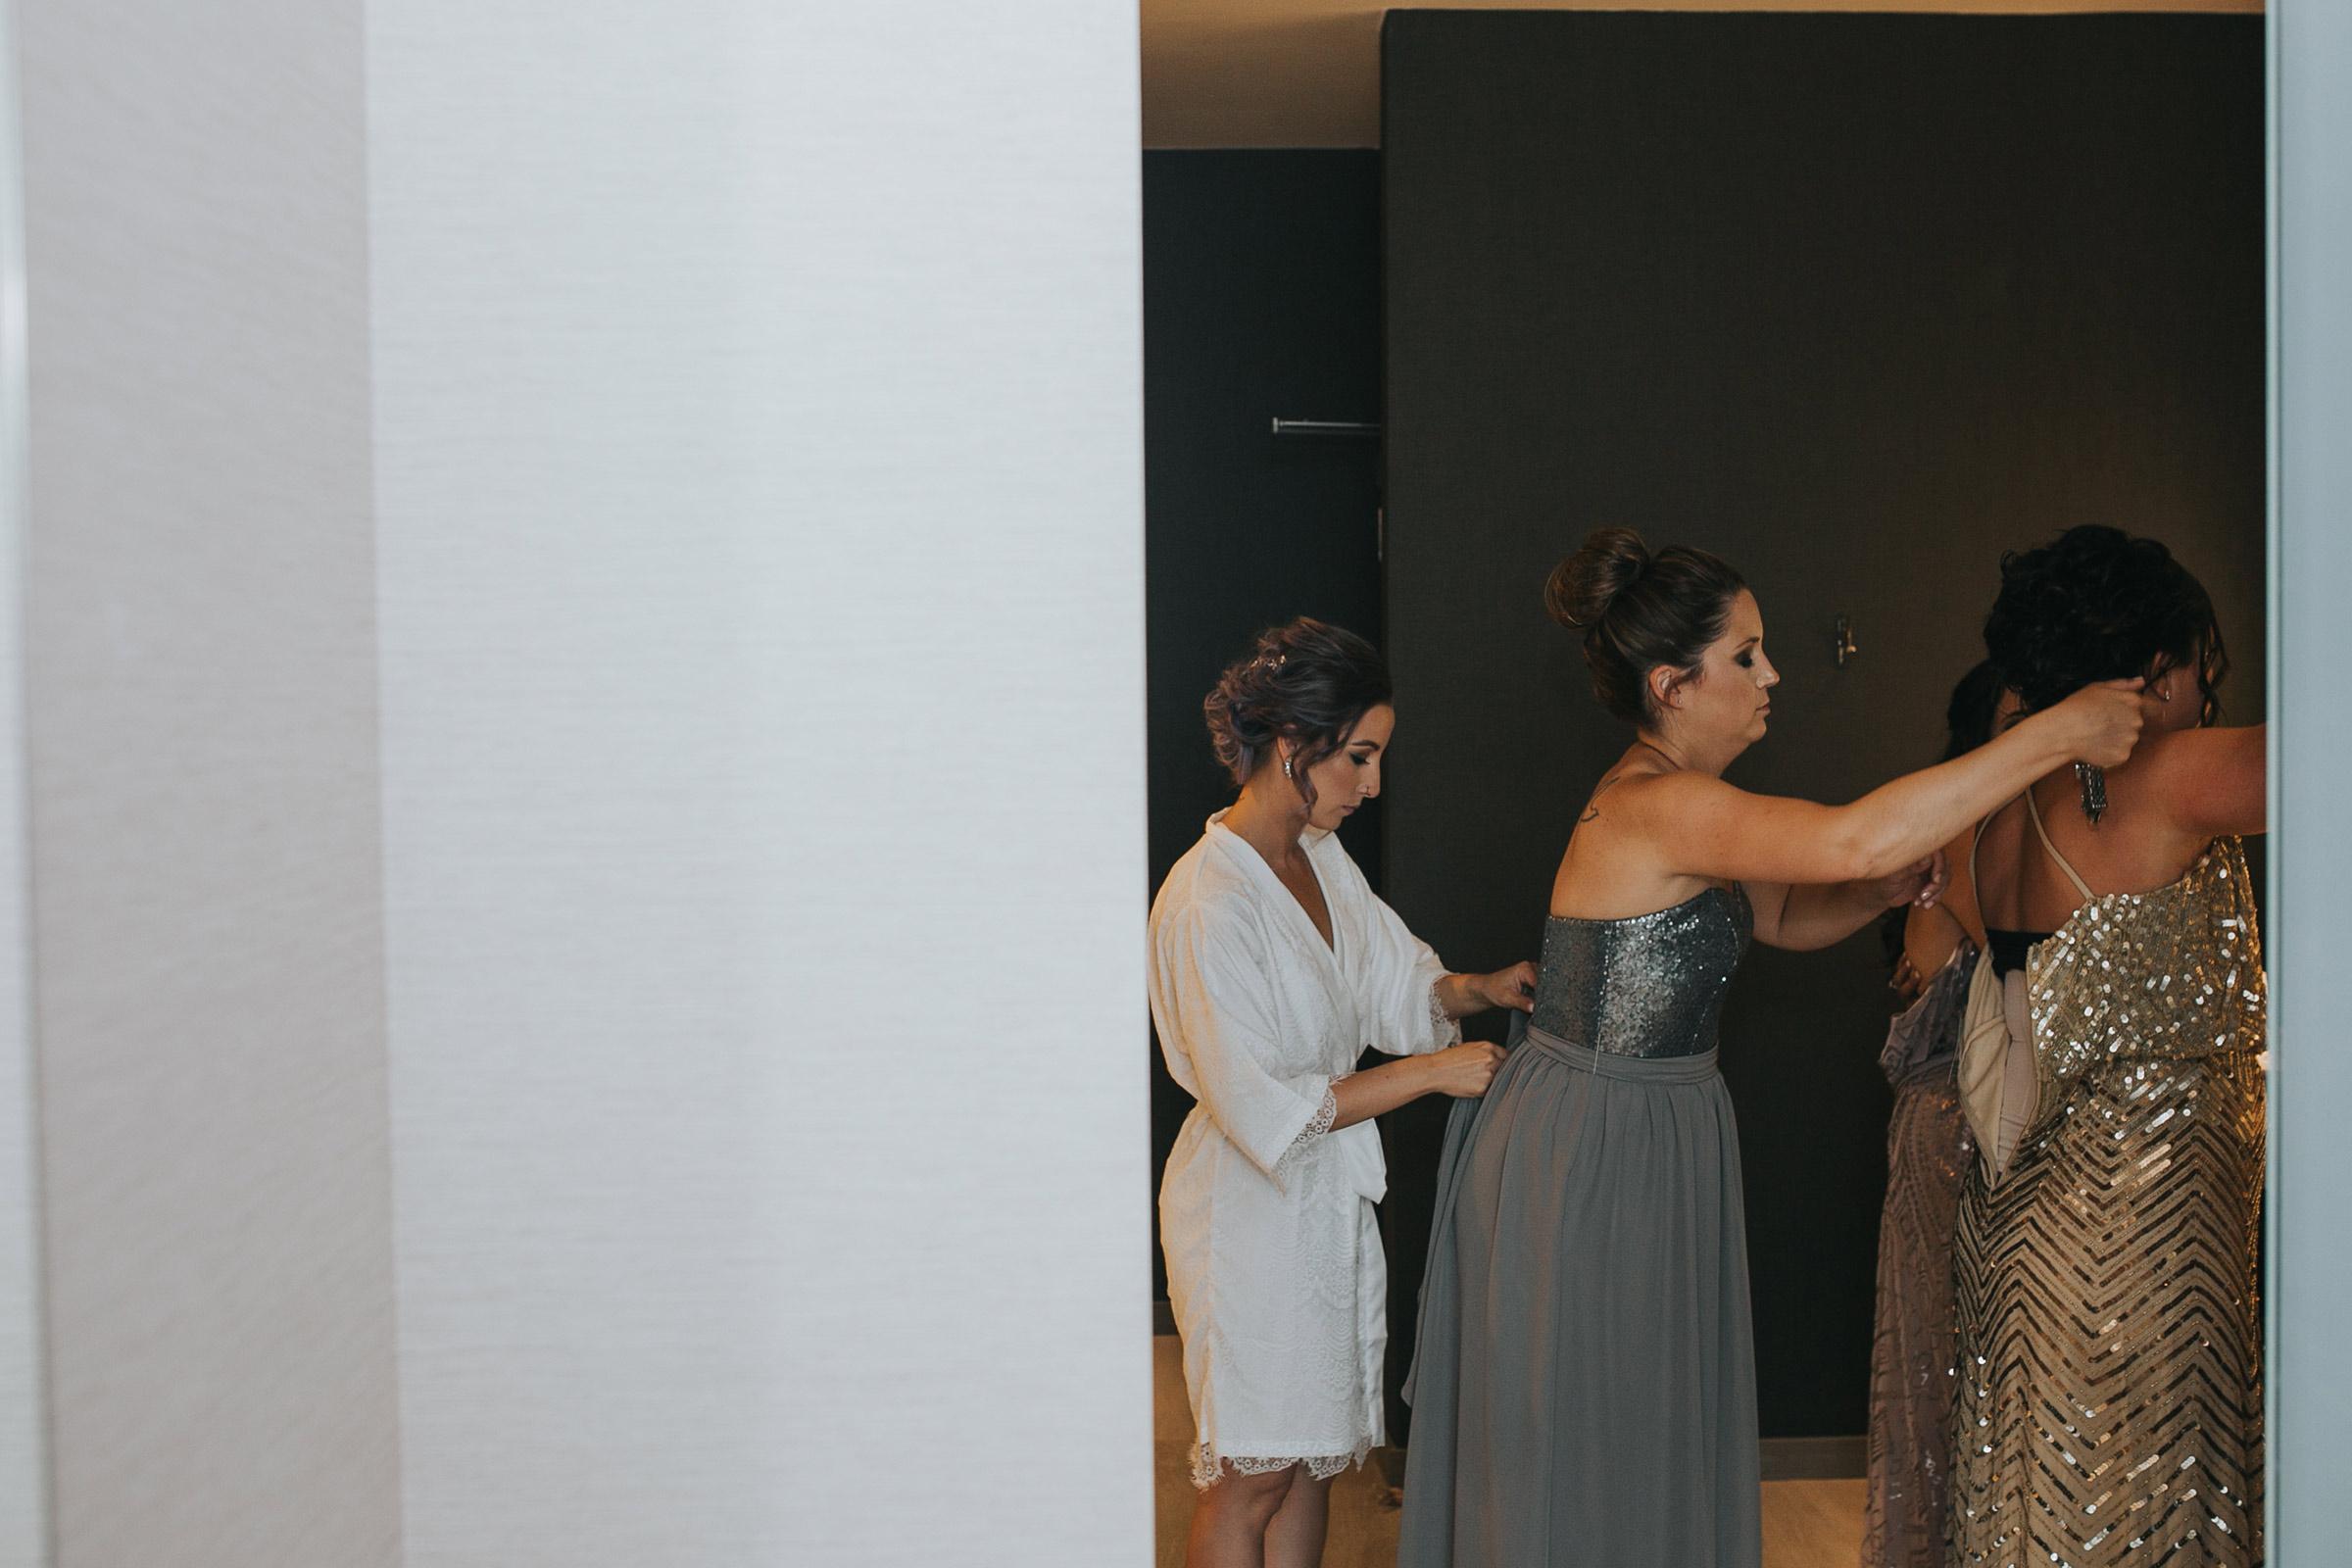 bride-helping-bridesmaids-get-ready-desmoines-iowa-ac-hotel-raelyn-ramey-photography.jpg